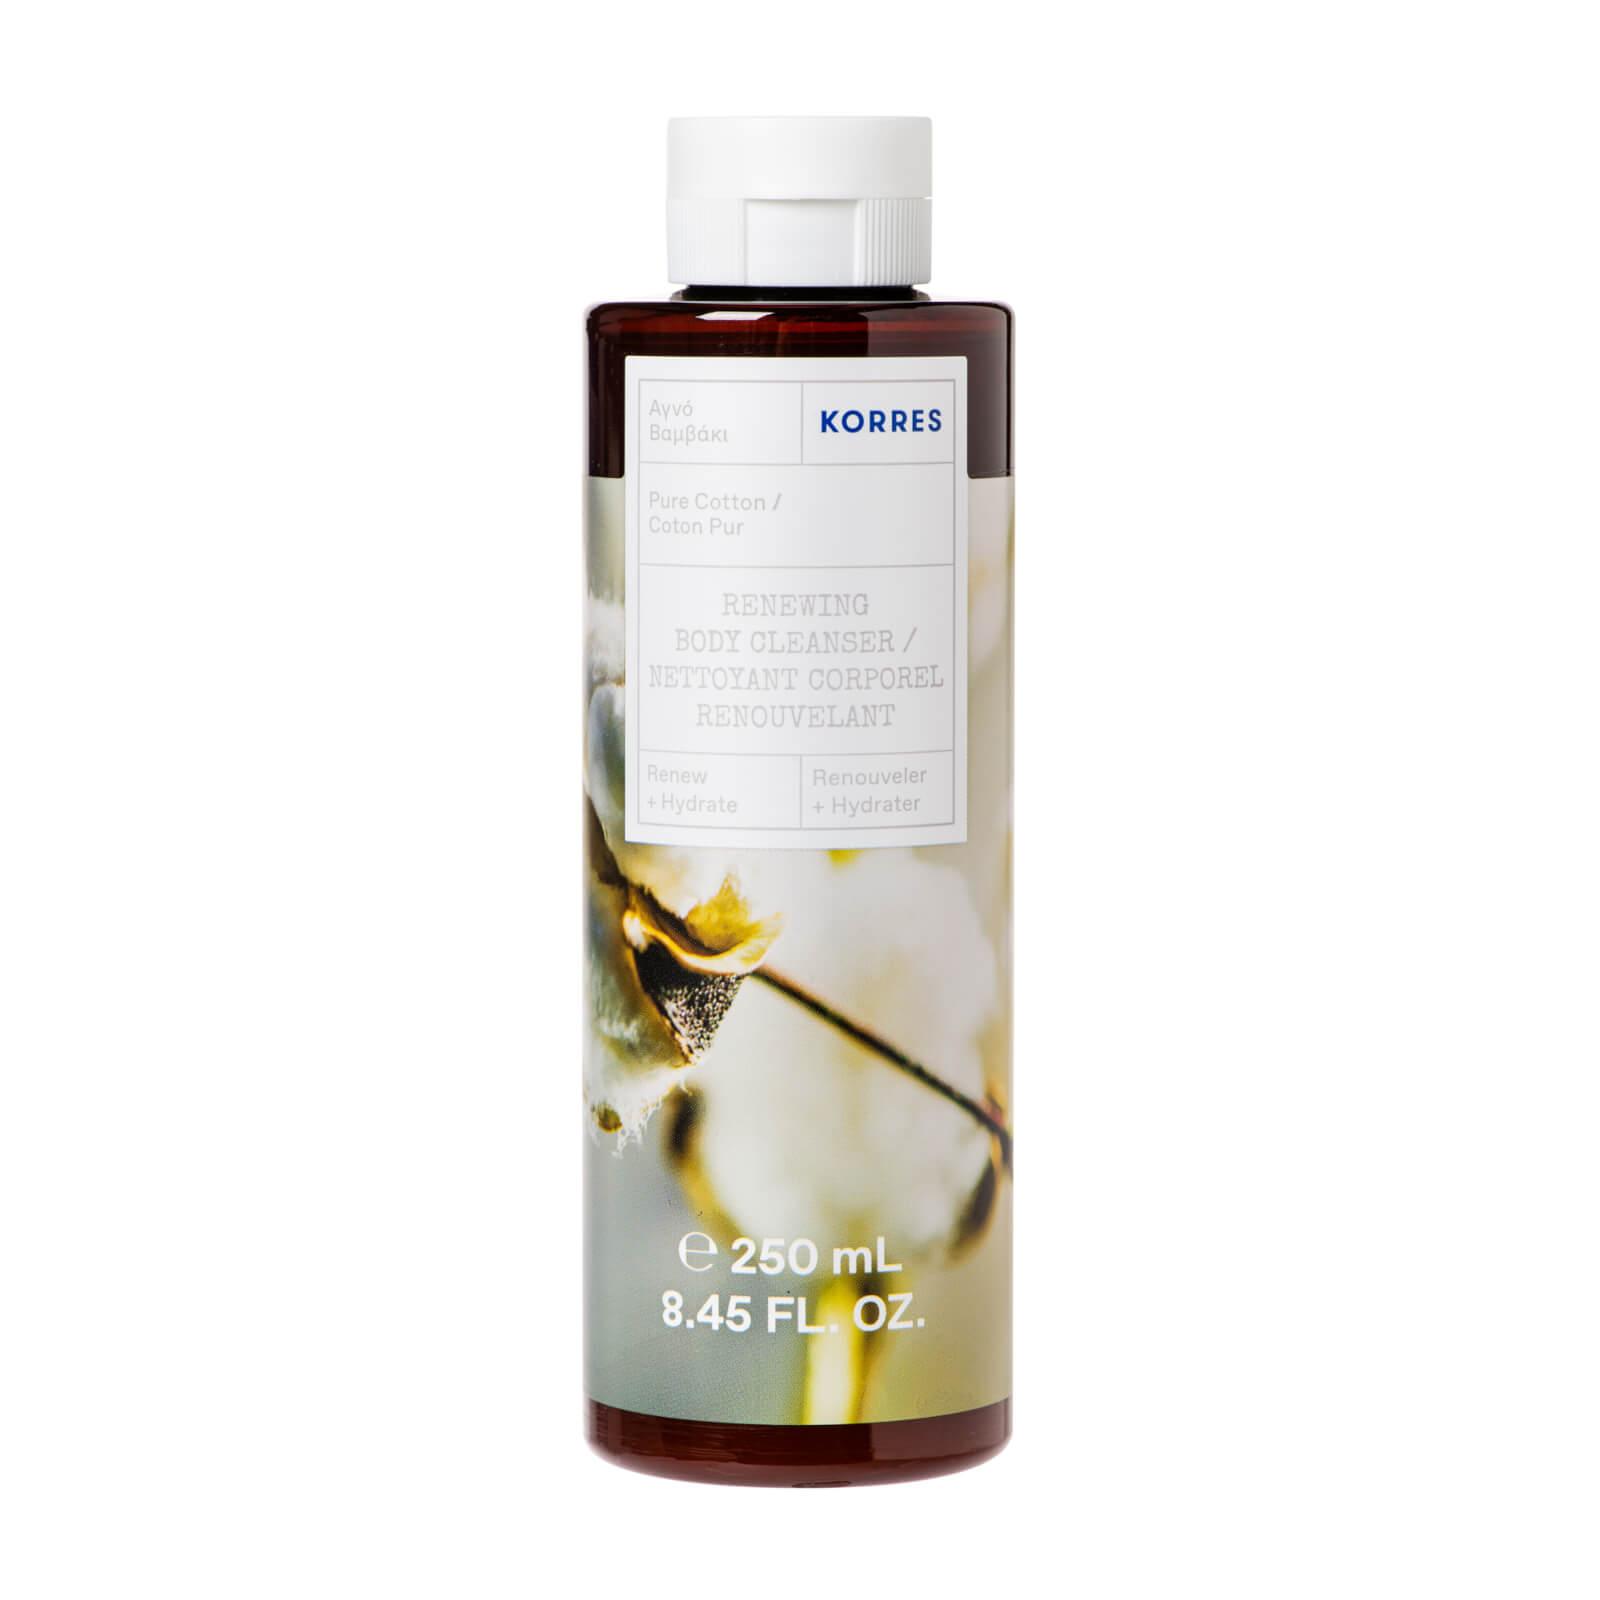 Купить Korres Pure Cotton Renewing Body Cleanser 250ml